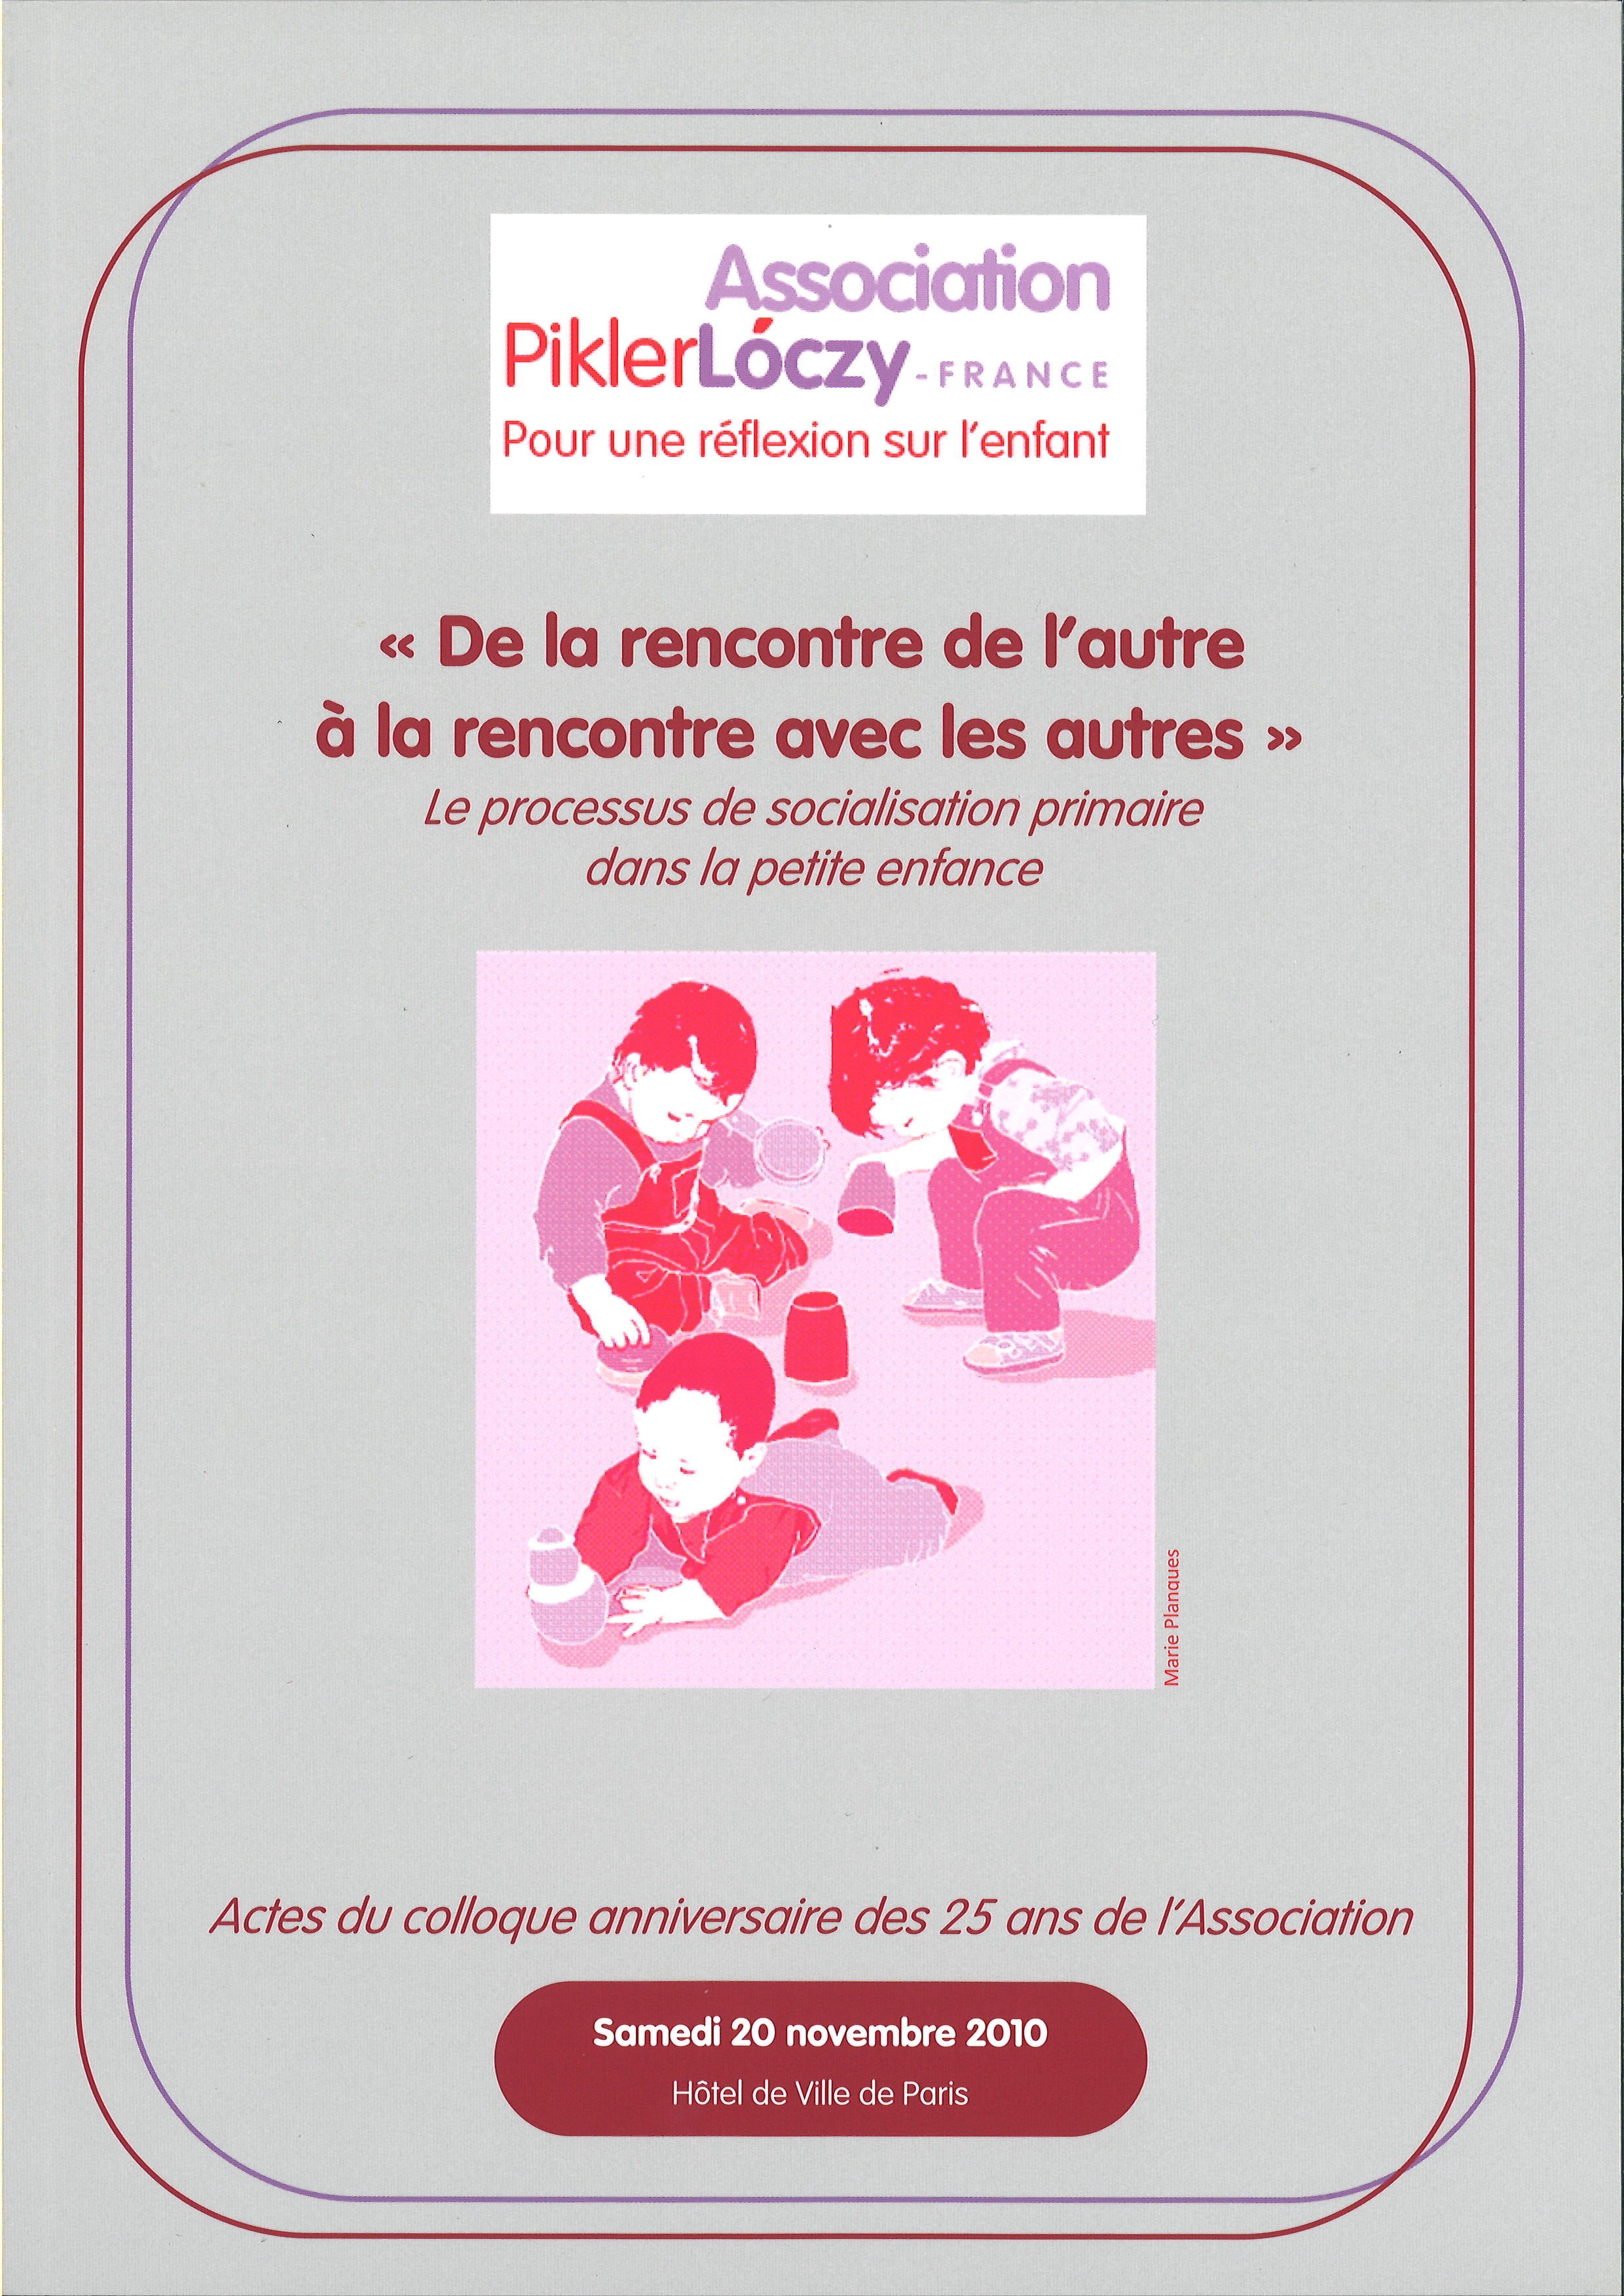 Enfance + Culture = Socialisation